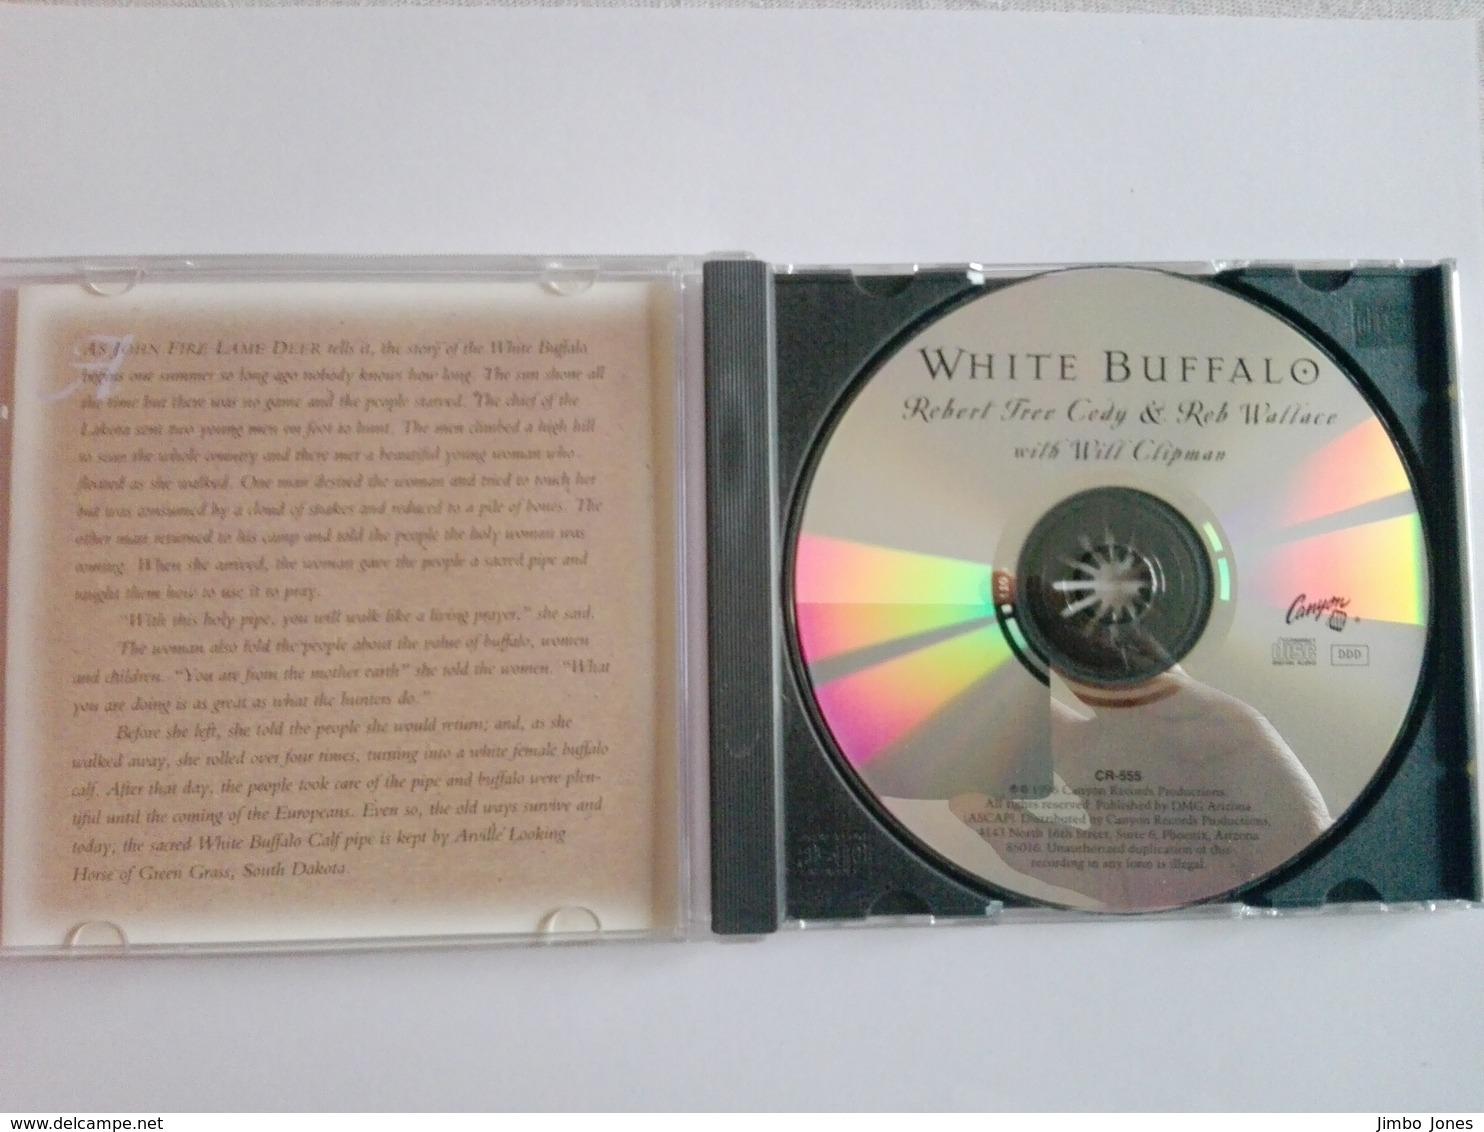 Robert Tree Cody & Rob Wallace - White Buffalo (1996) CD - World Music